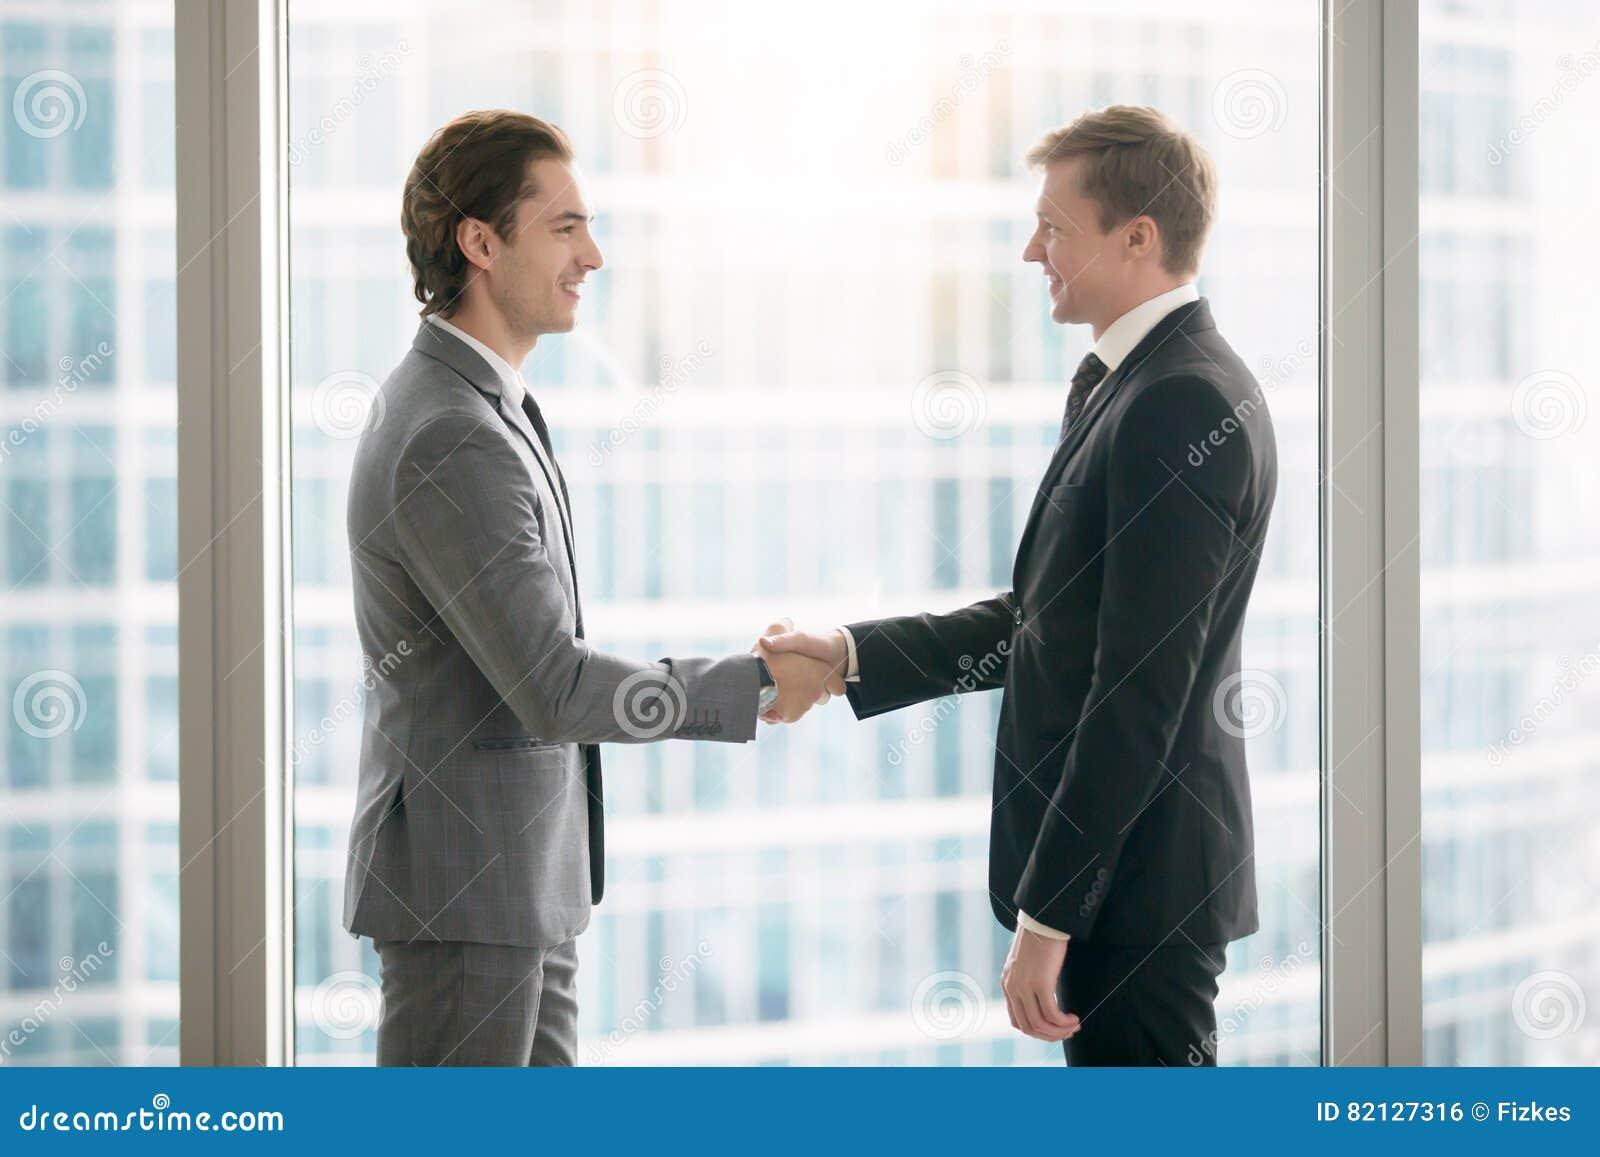 Business people handshake greeting deal at work photo free download - Business People Handshake Greeting Deal At Work Photo Free Download 6